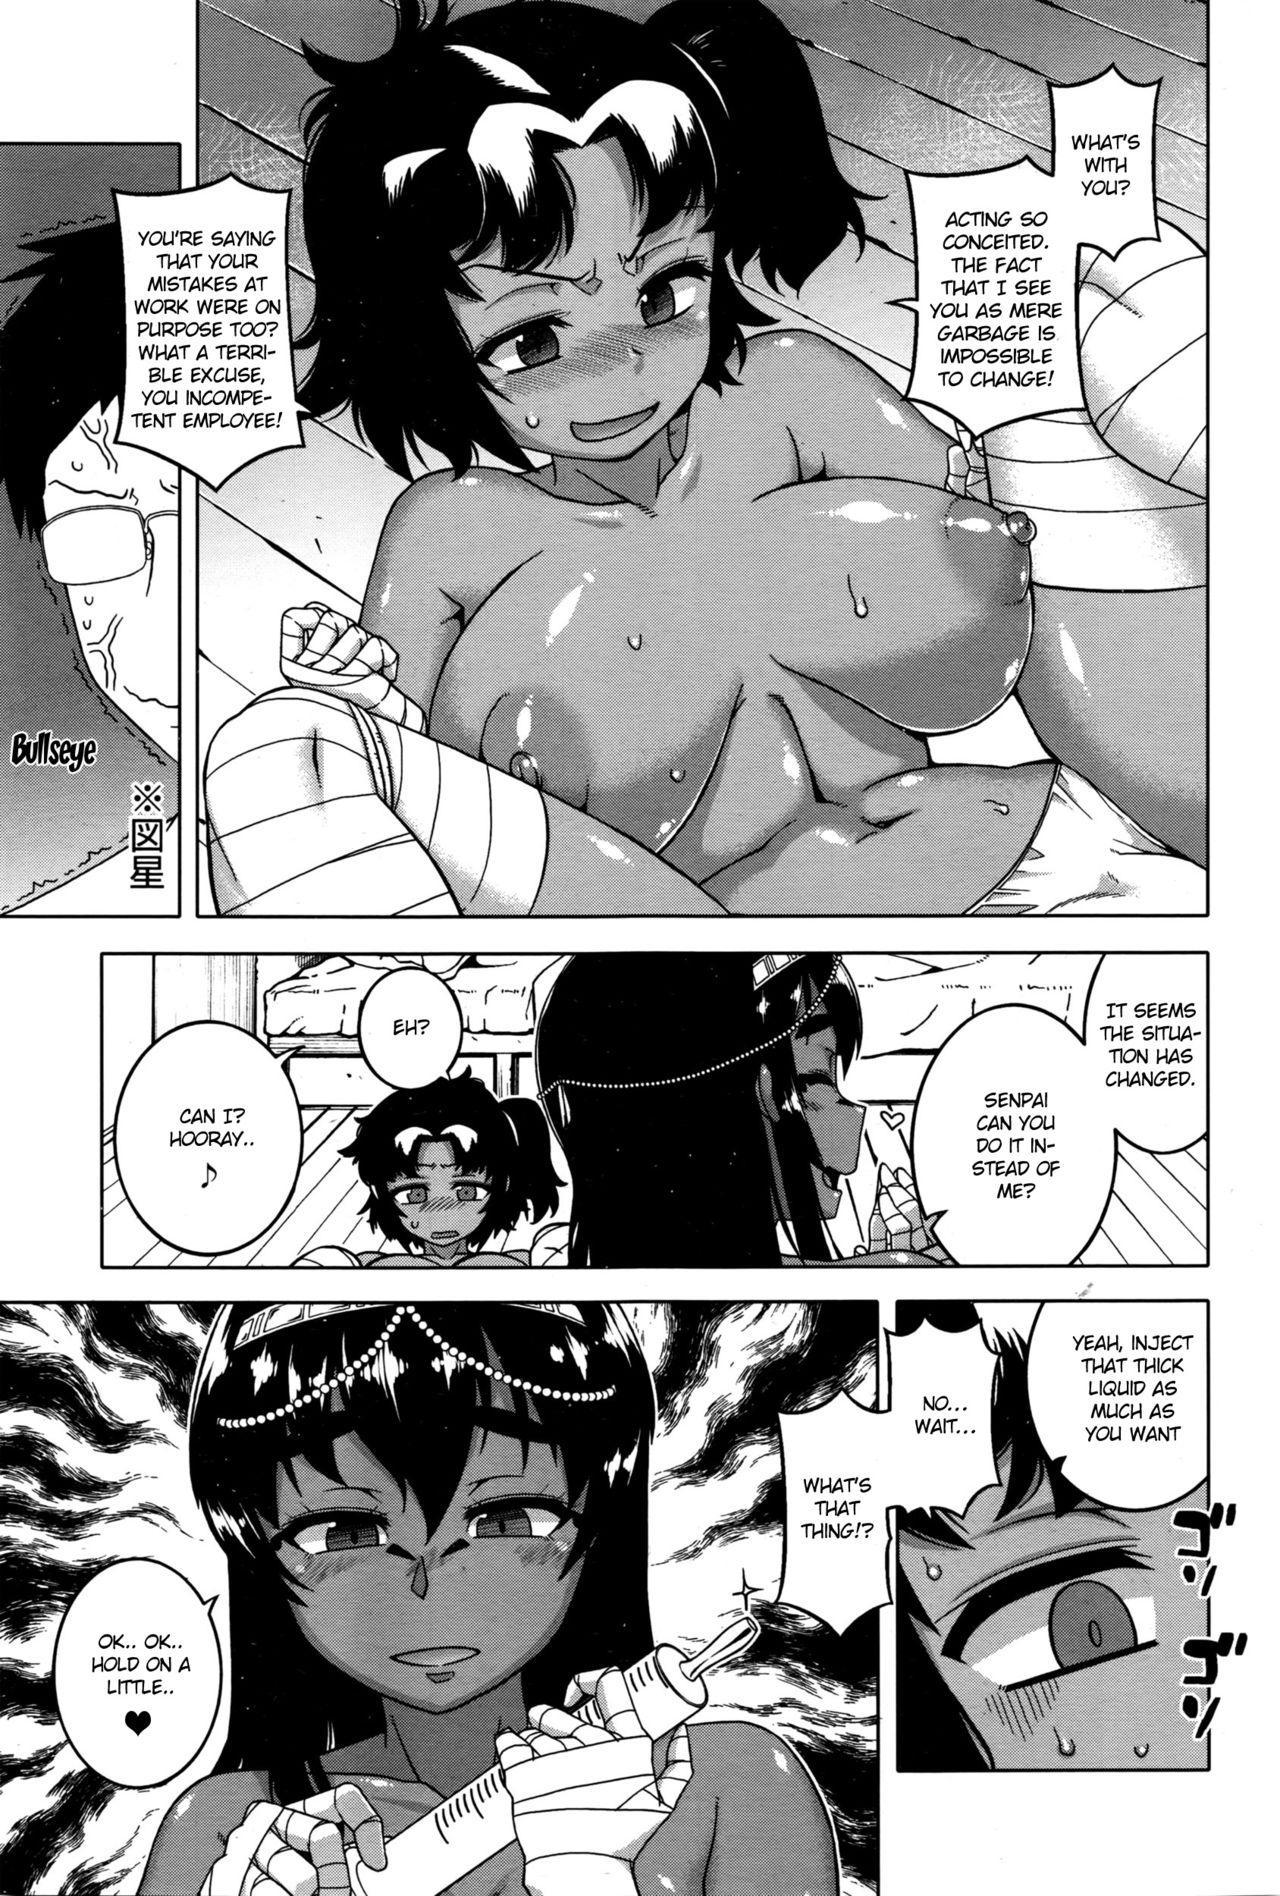 [Takatsu] Masaka Watashi no Pharaoh!?   Impossible, My Master (Pharaoh) is !? (COMIC Megastore Alpha 2016-11) [English] [mgsj123] 6